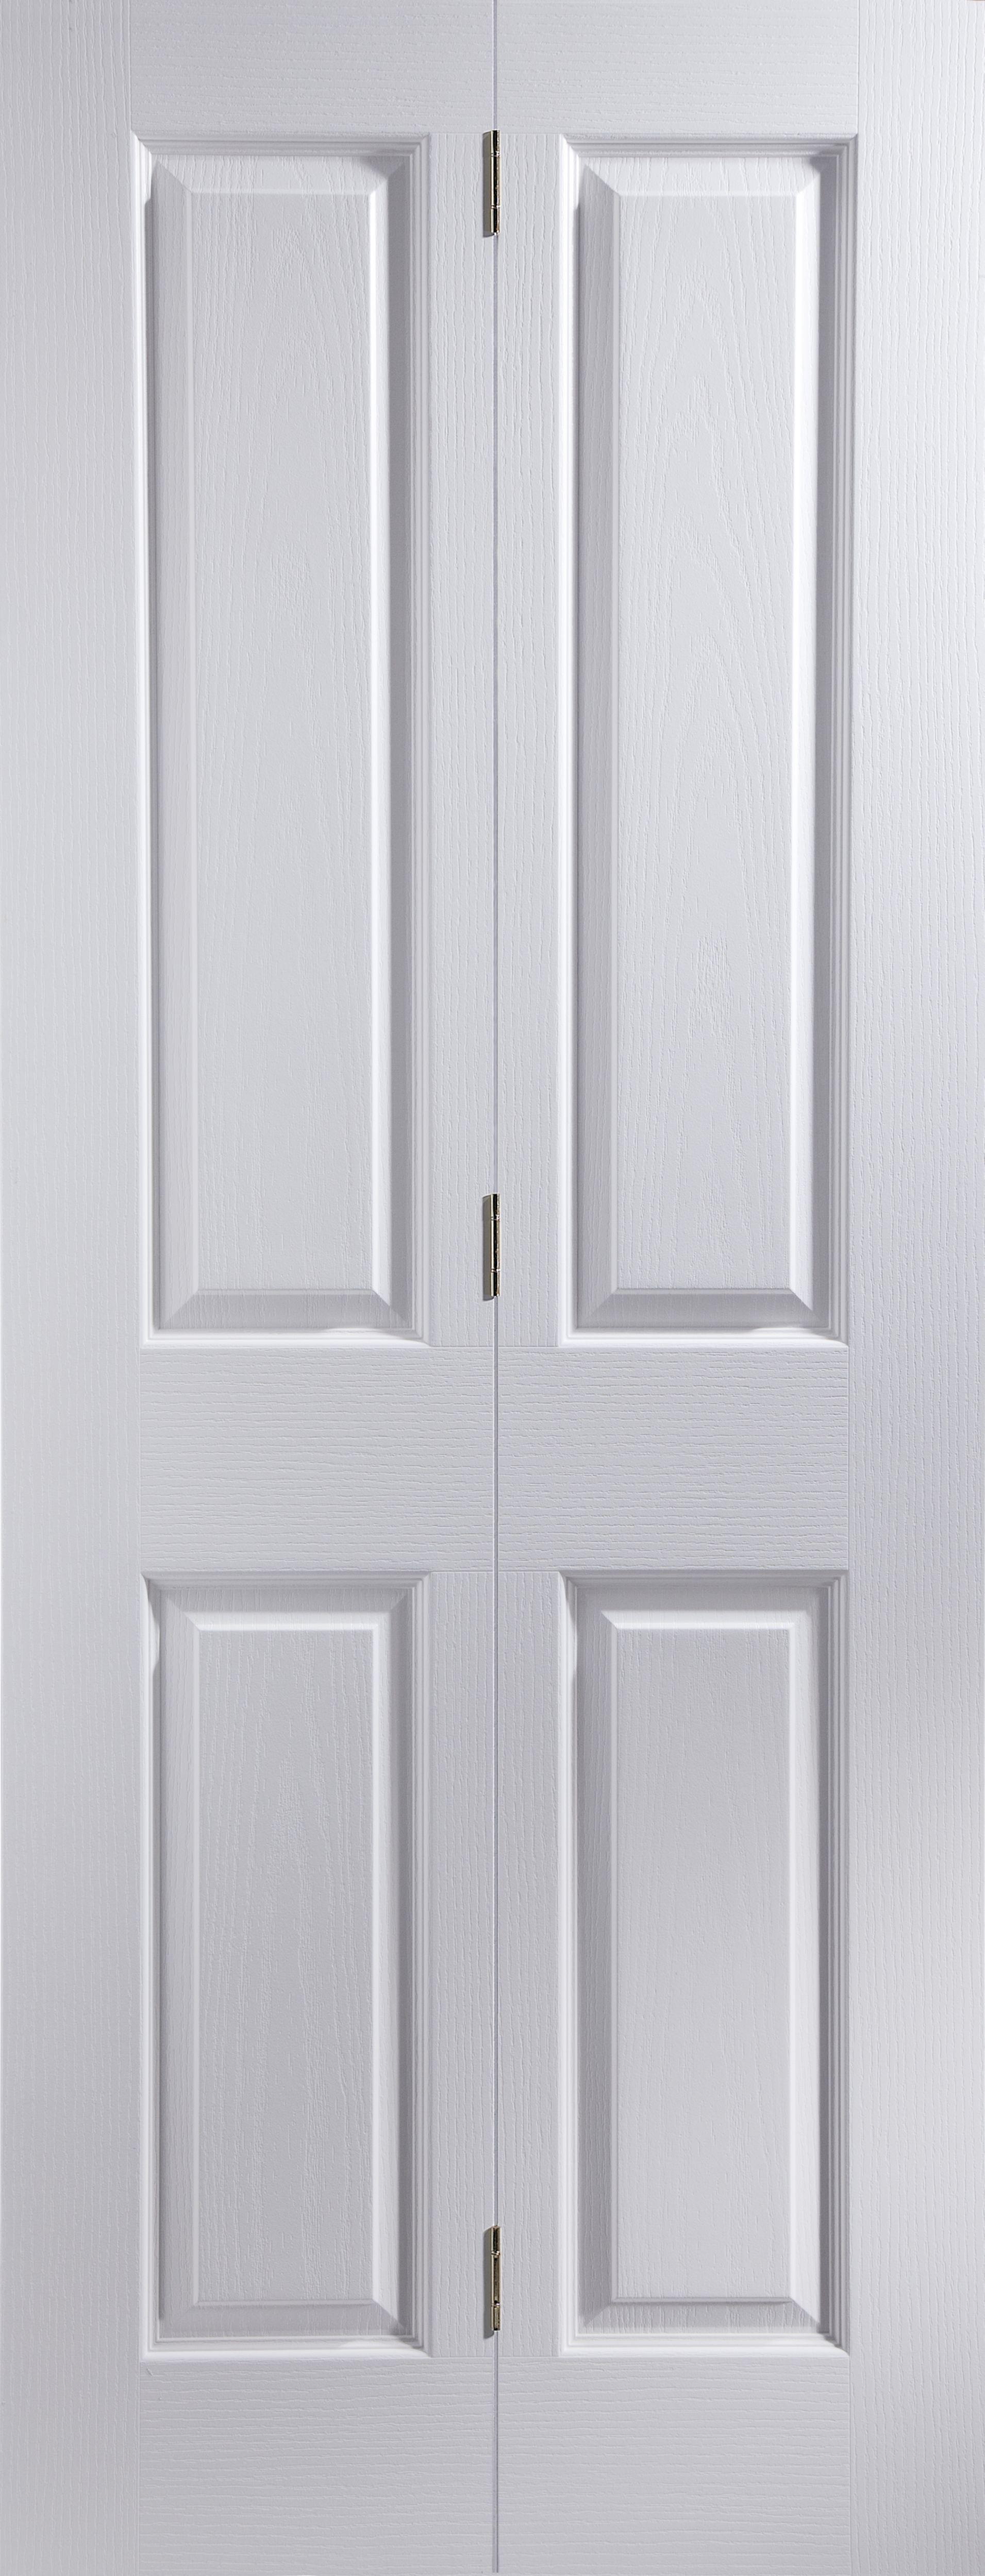 4 Panel Primed Woodgrain Effect Unglazed Internal Bi-fold Door, (h)1950mm (w)826mm